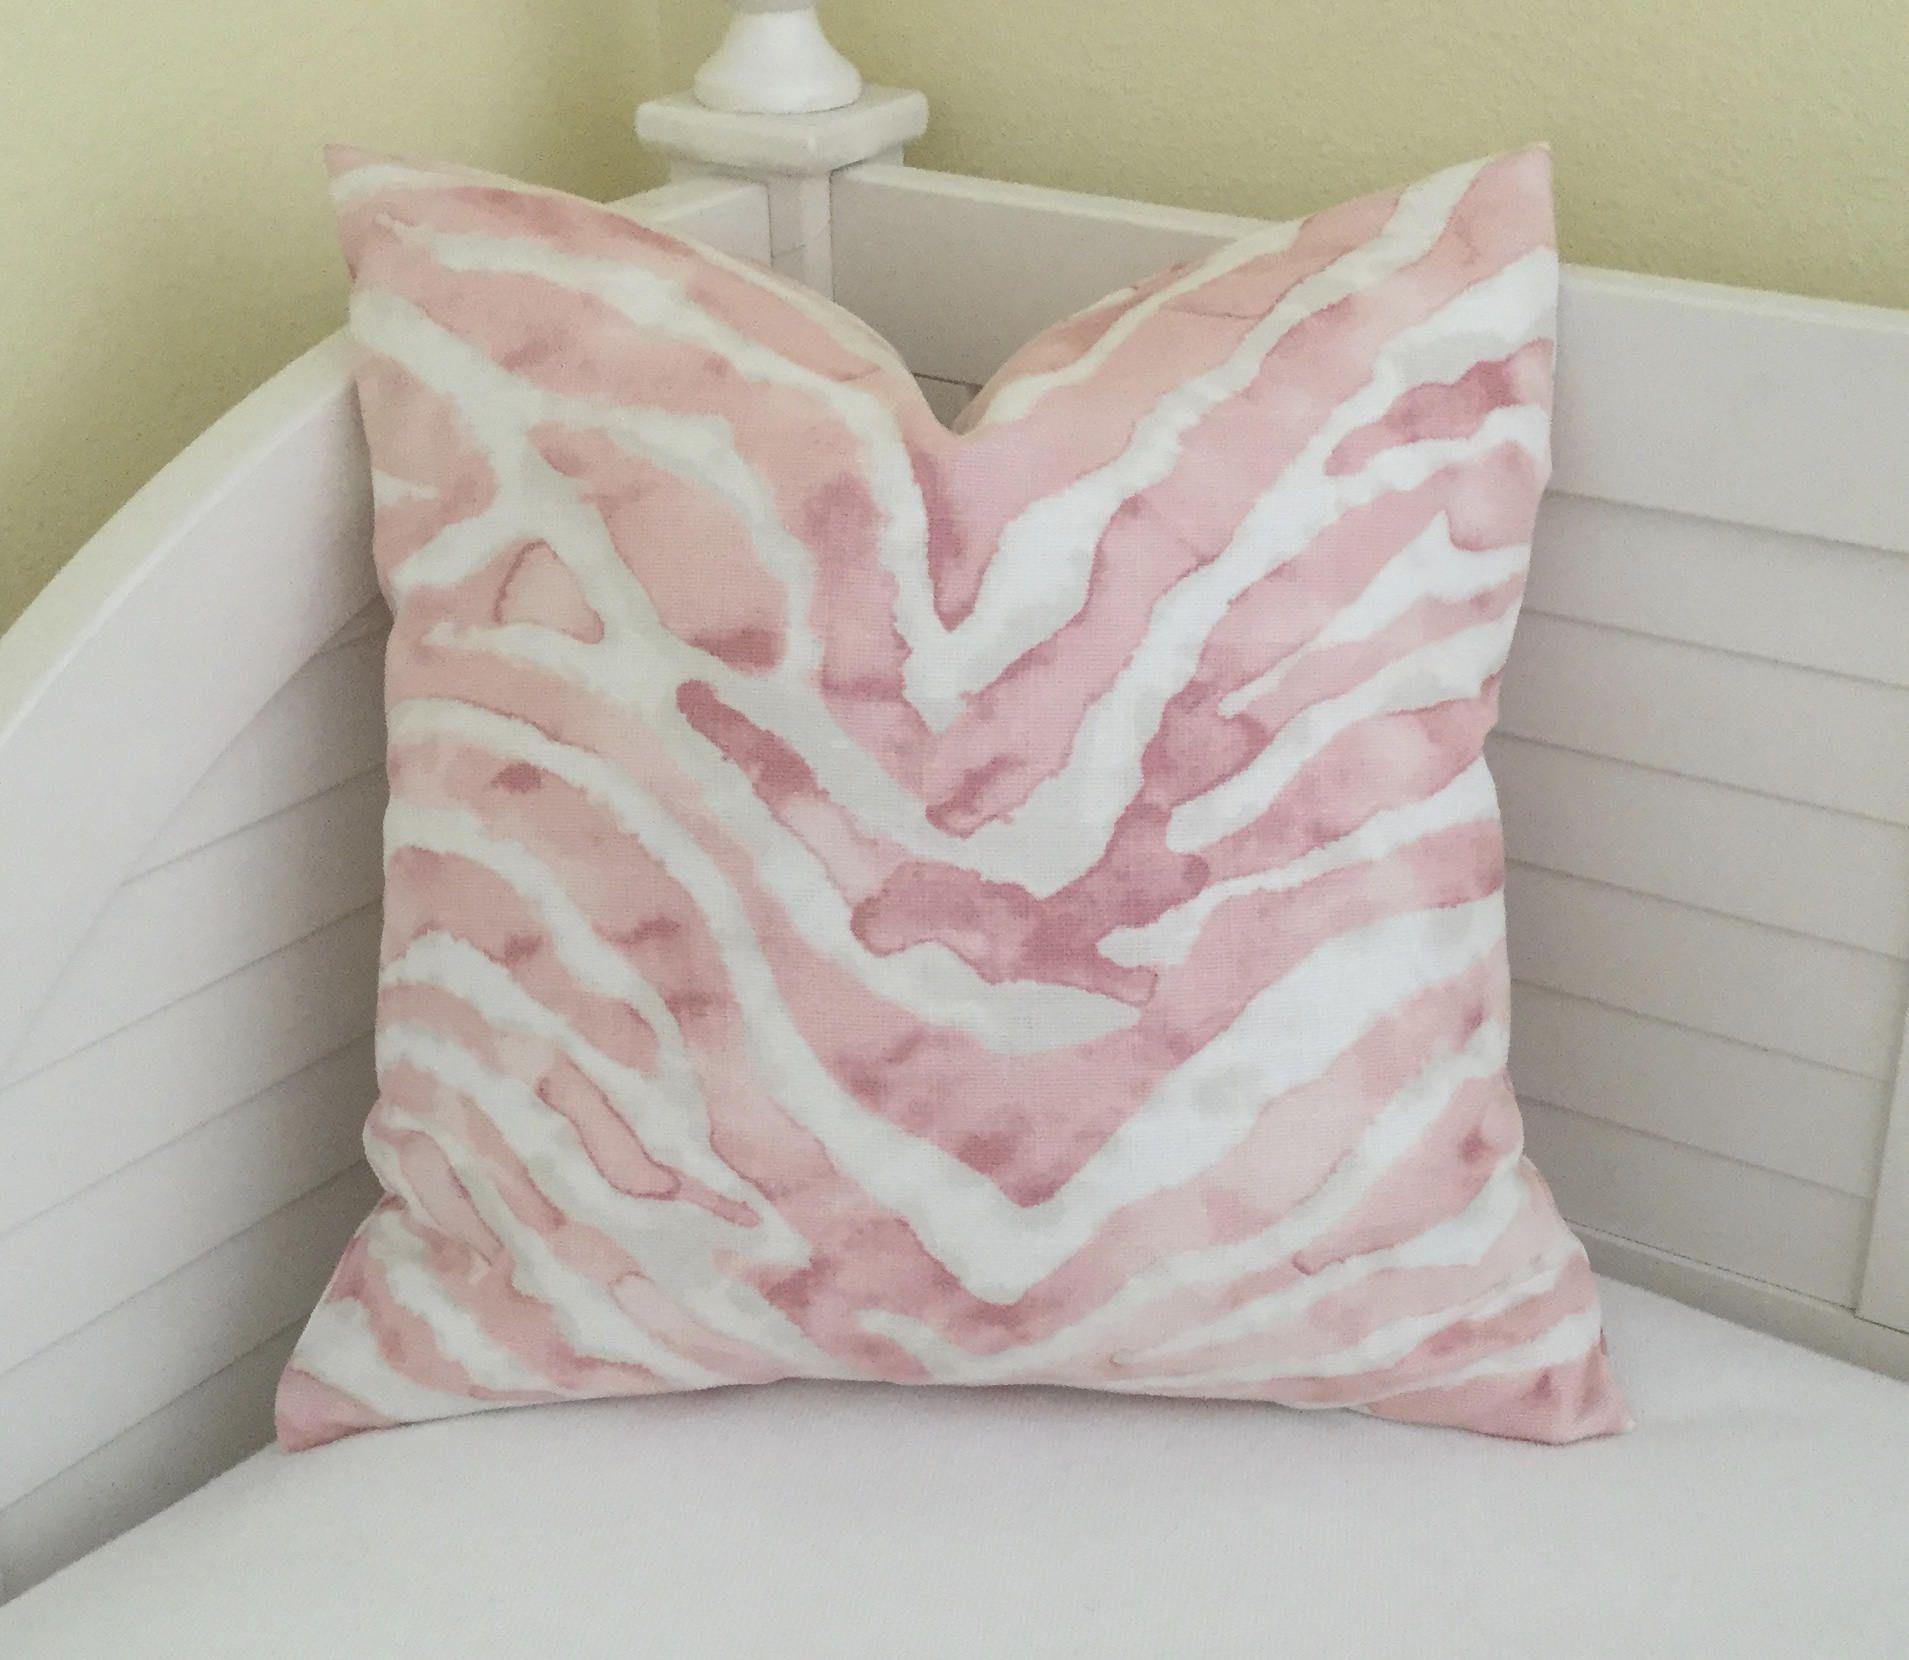 Blush petal pink animal print designer pillow cover on both sides